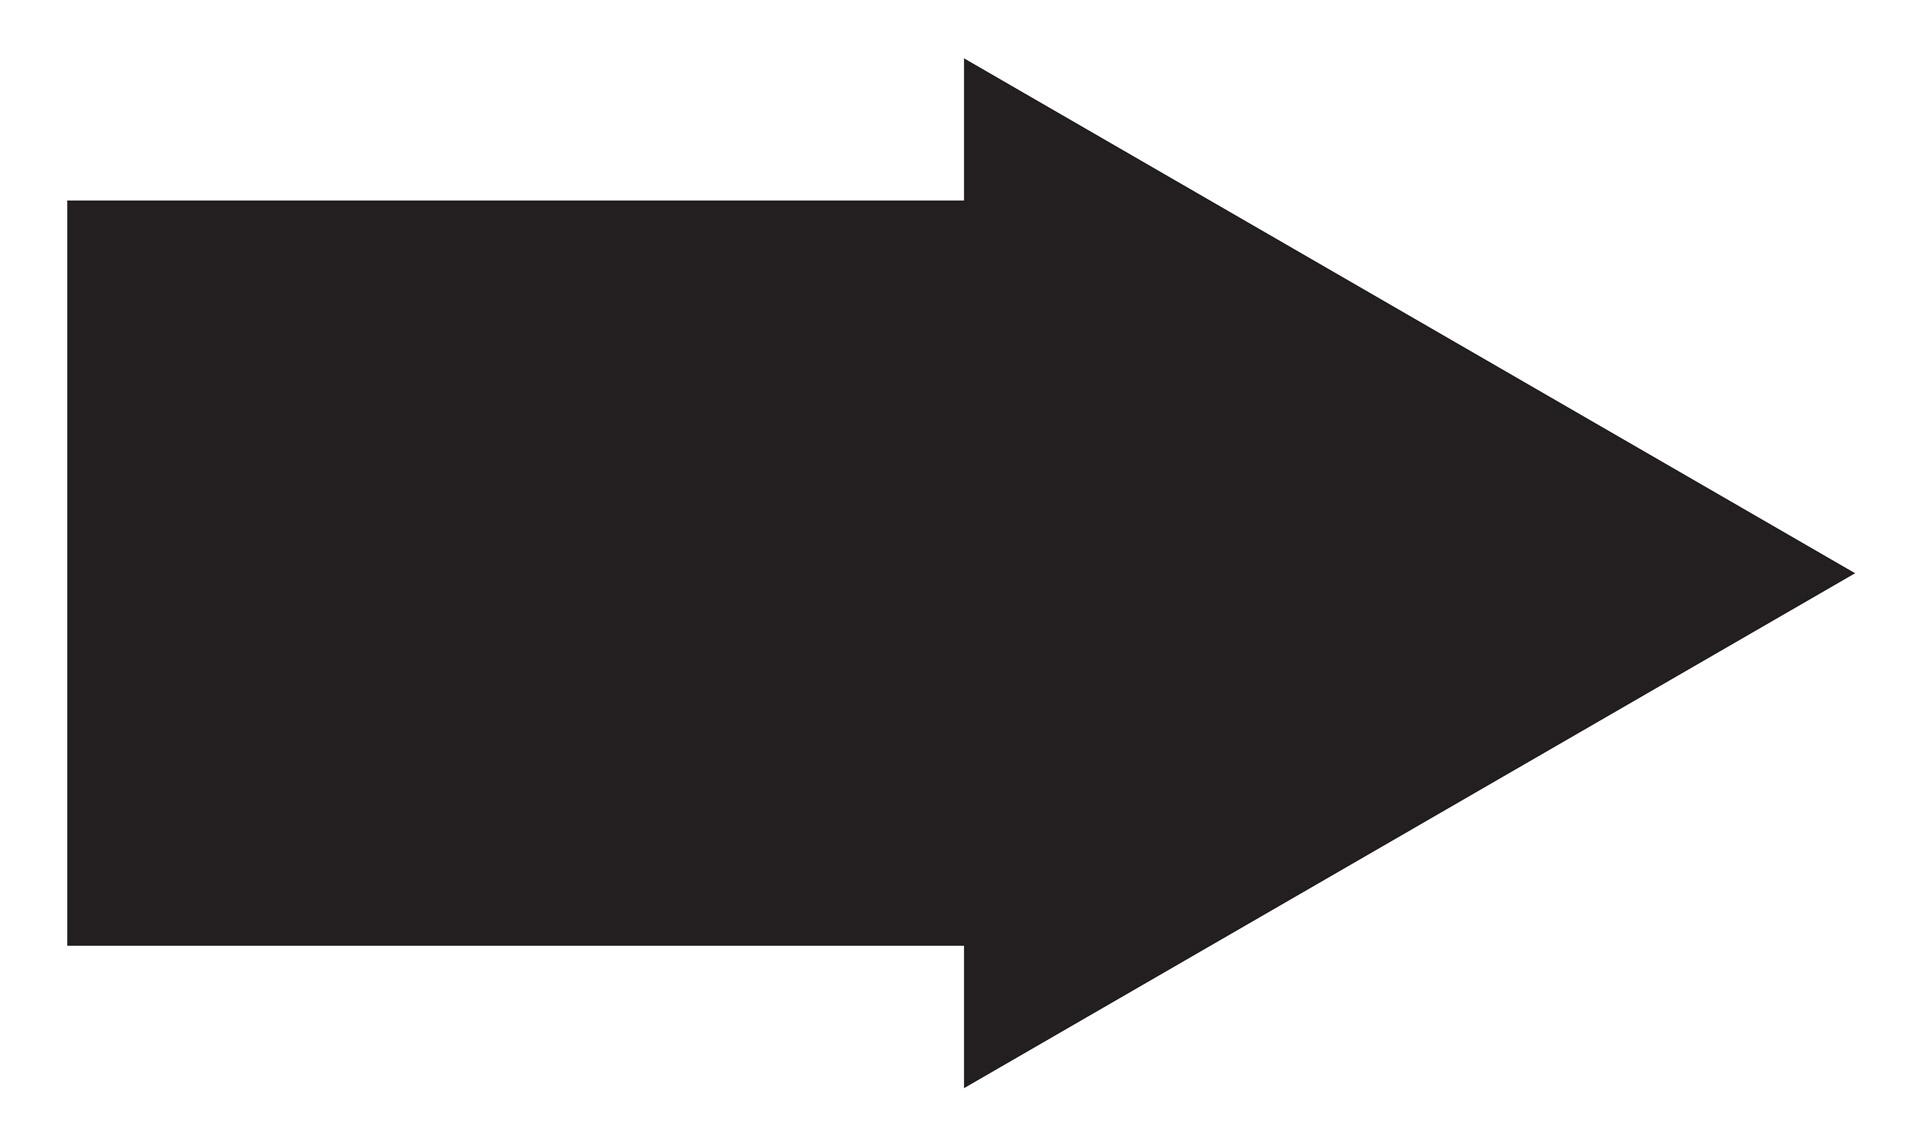 Black Arrow Clipart